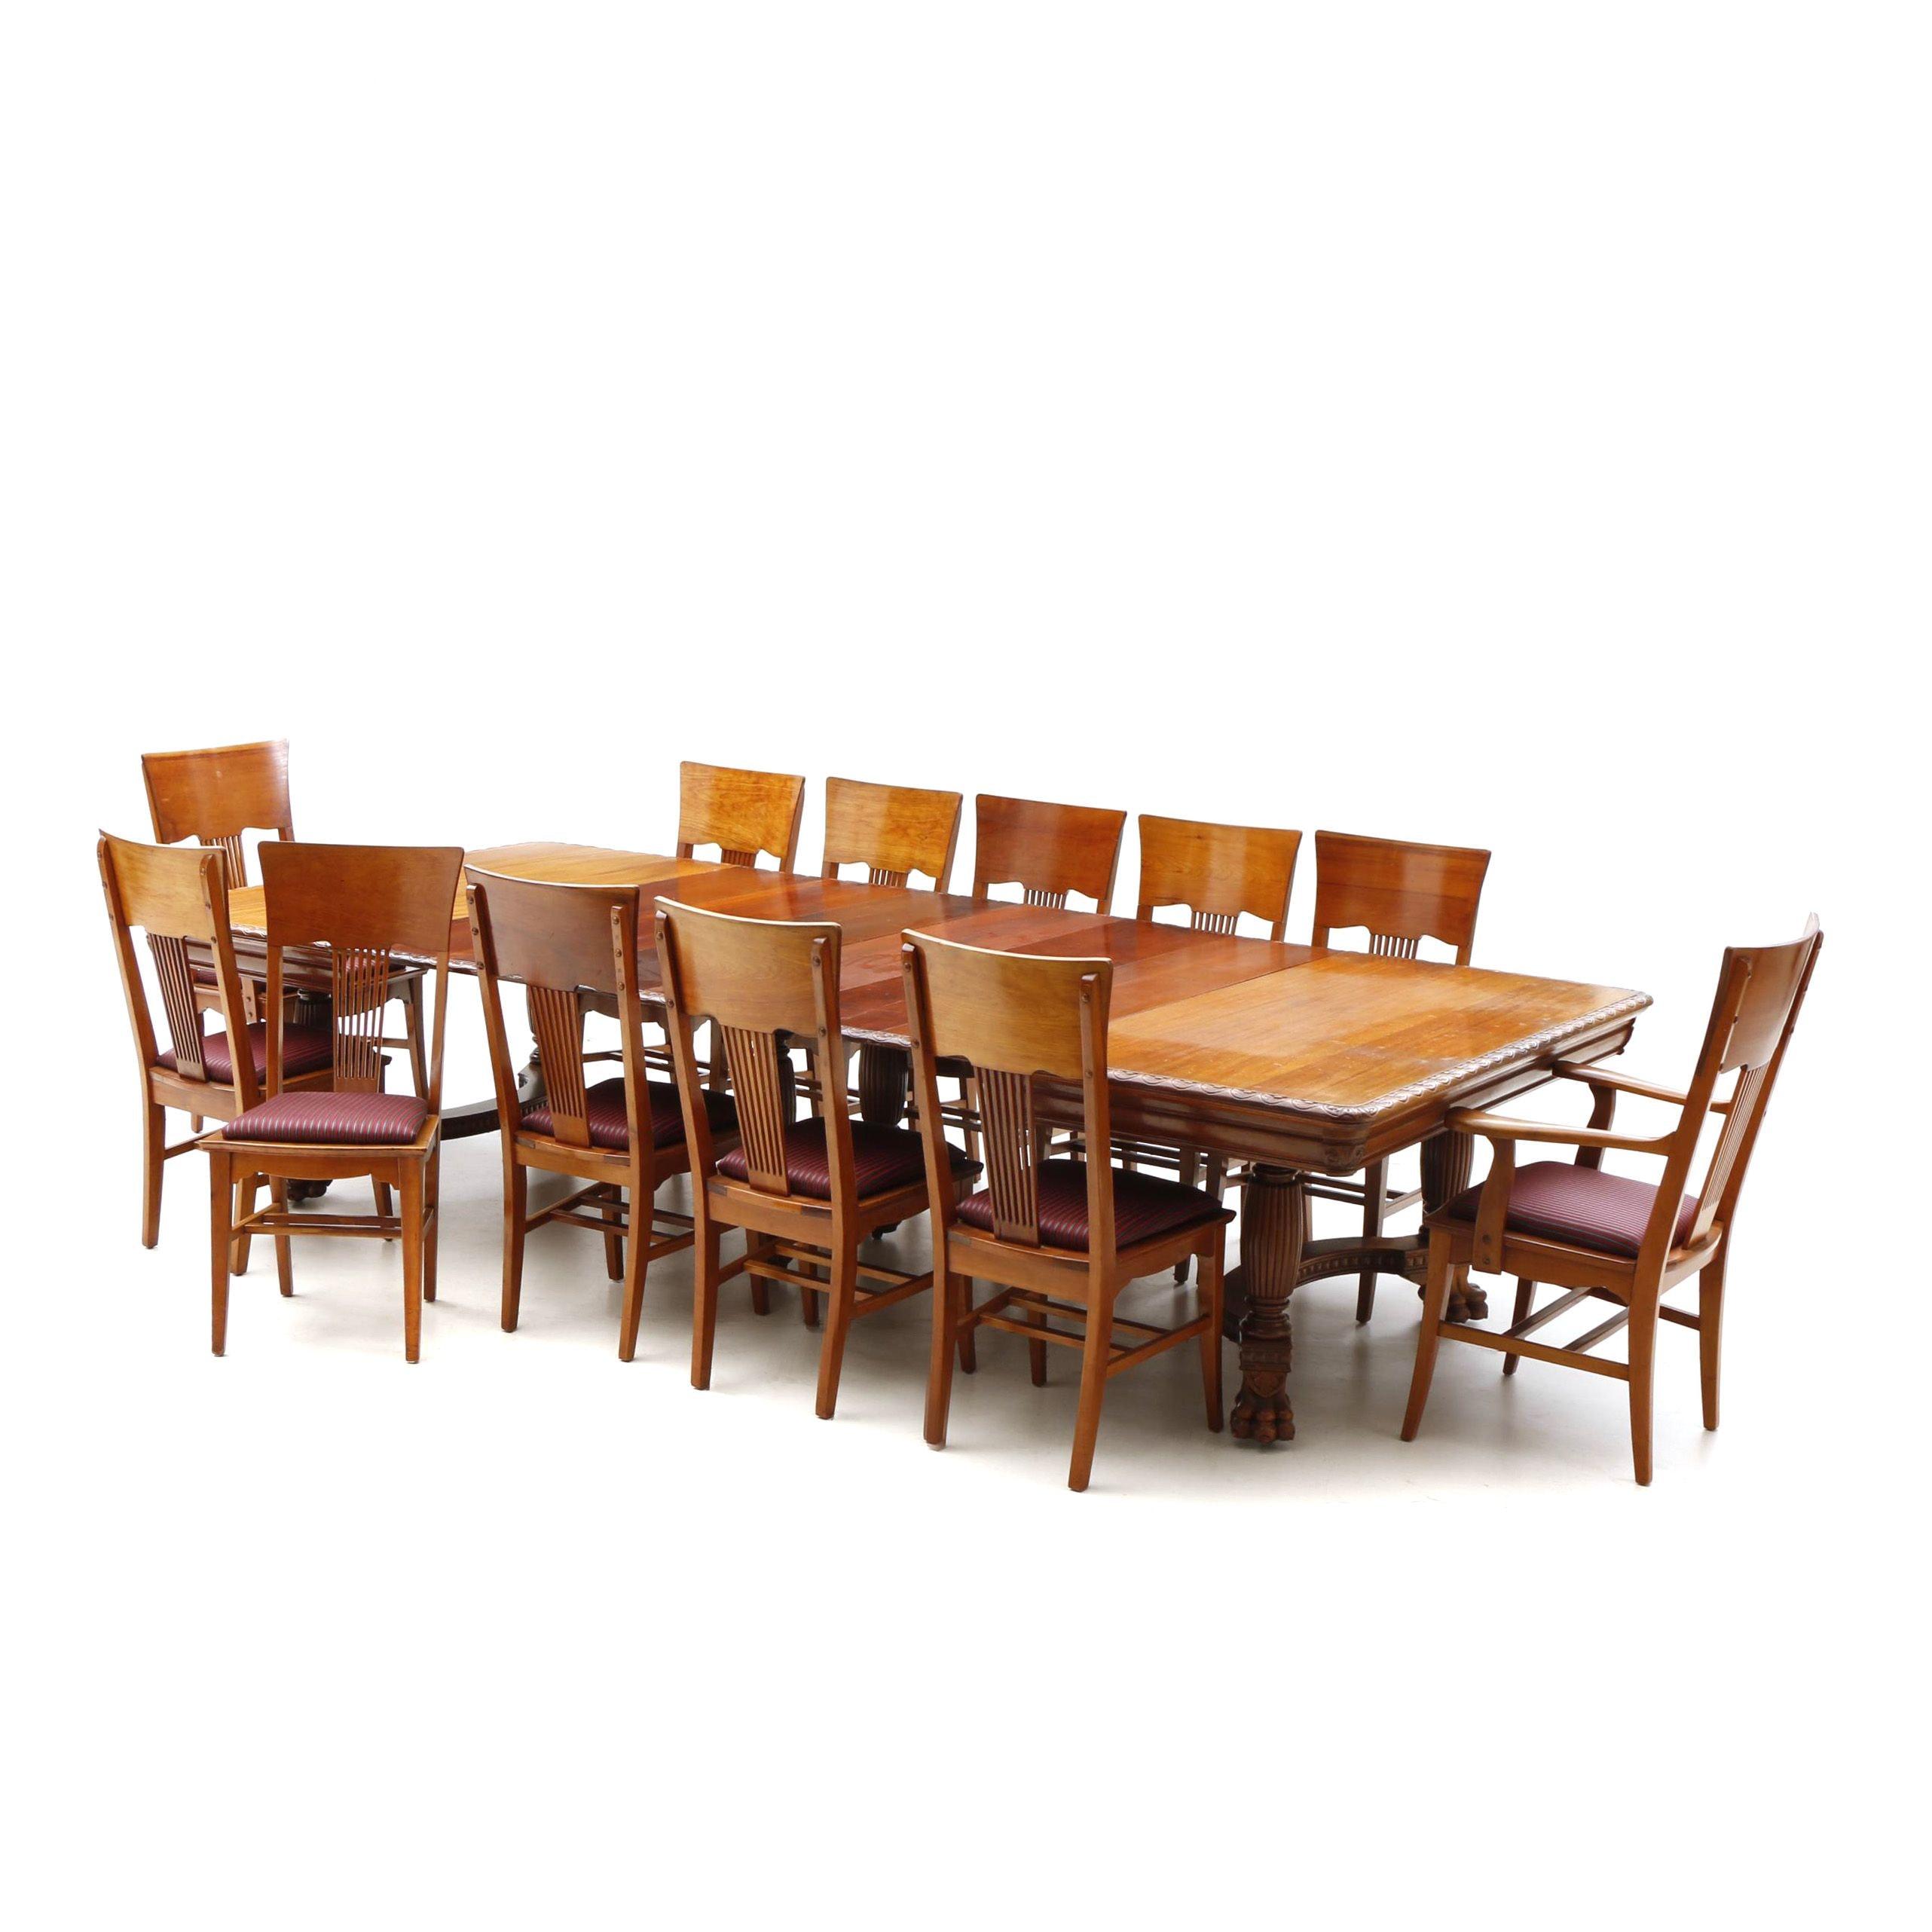 Late Victorian Mahogany Dining Room Set